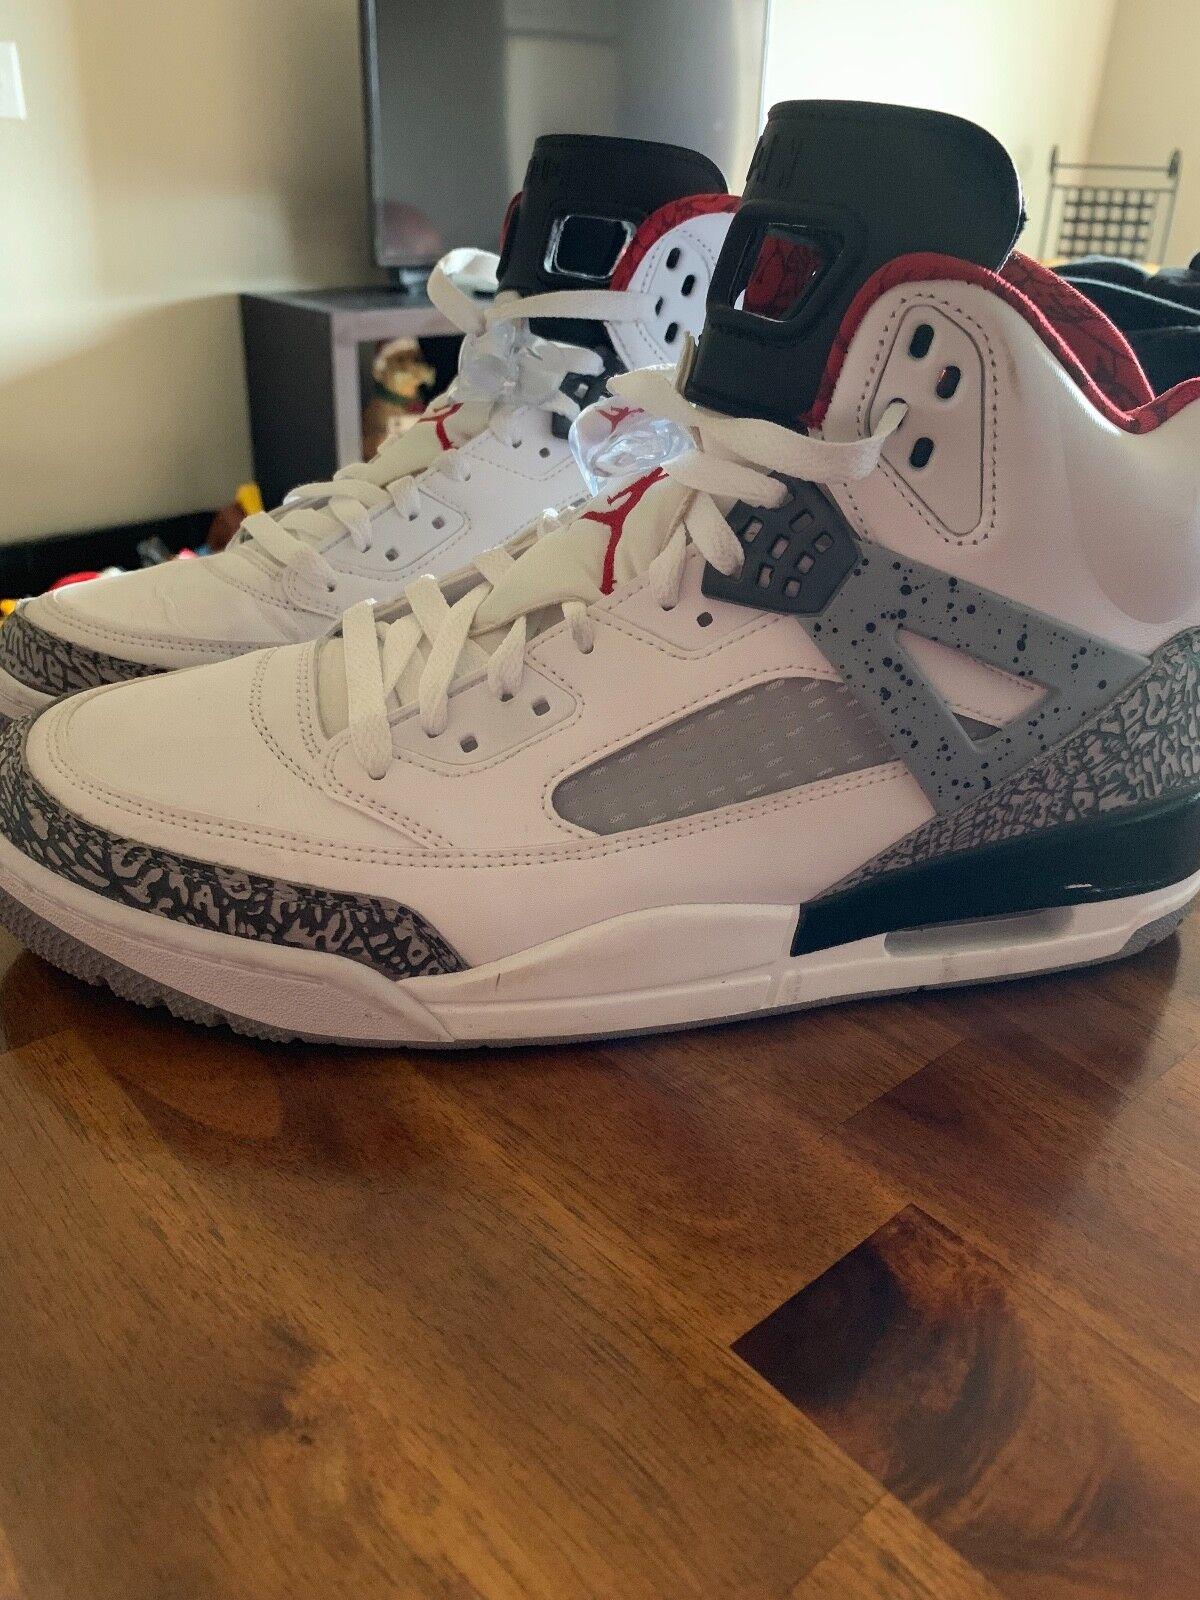 Jordans shoes size 13 only worn a few times